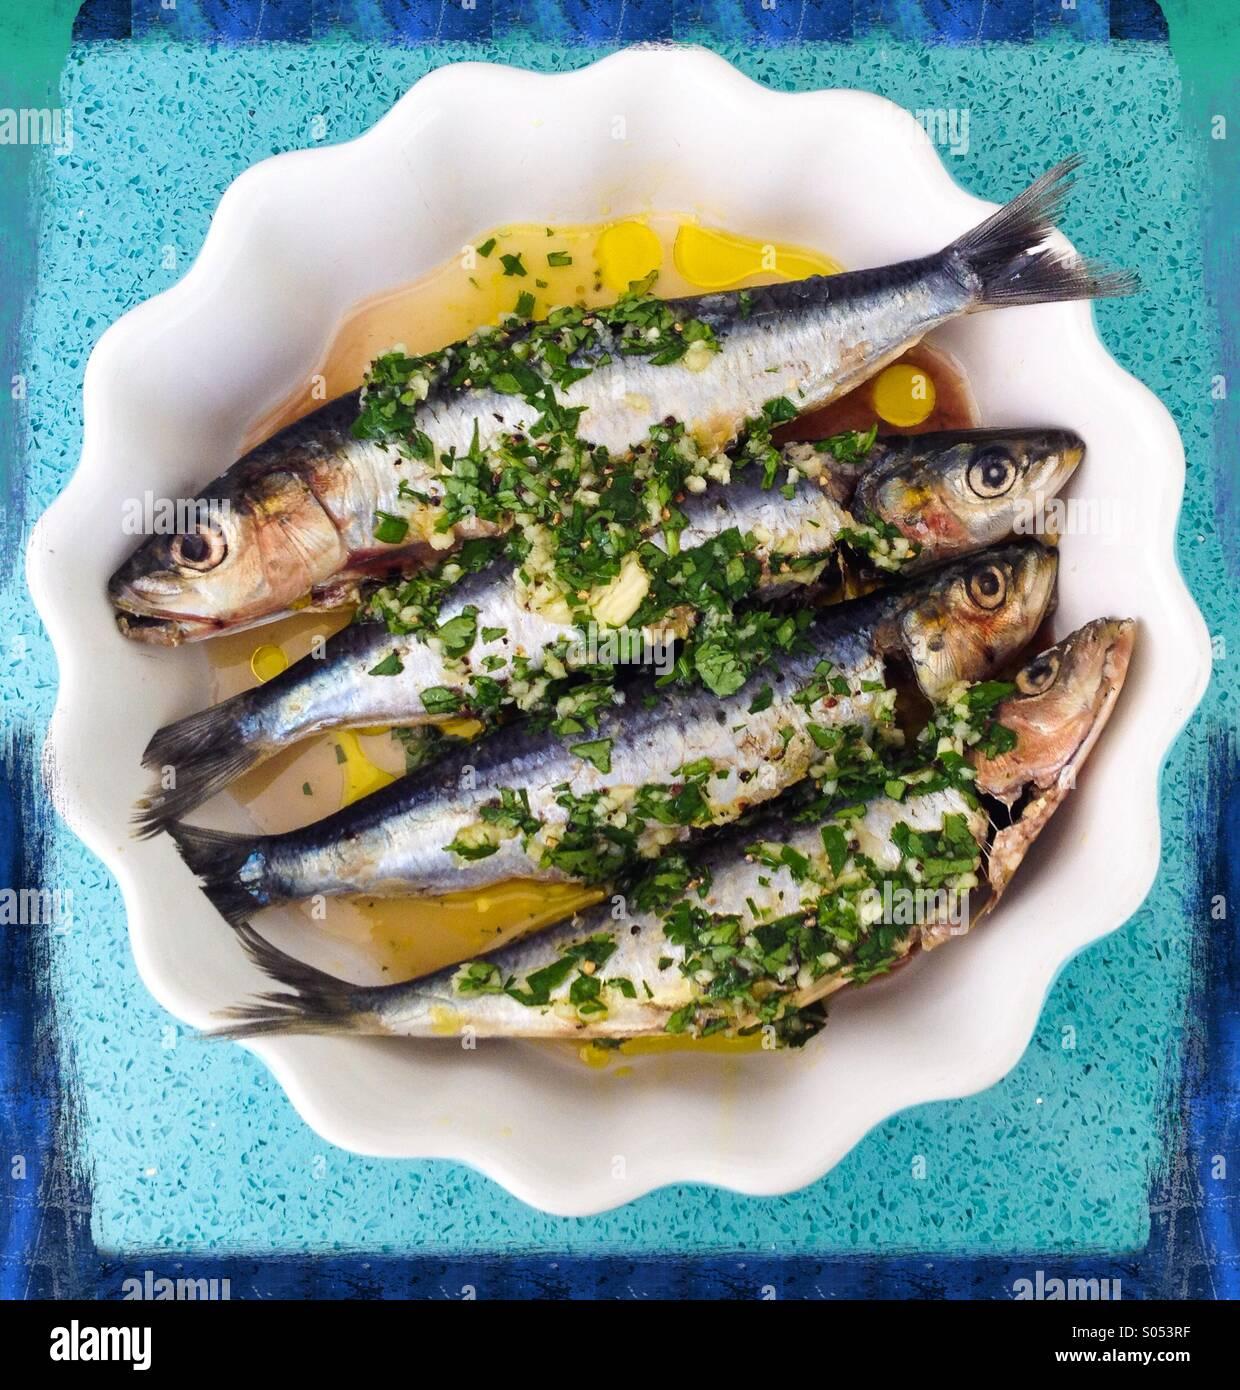 Sardines in lemon juice, garlic,olive oil and coriander. - Stock Image